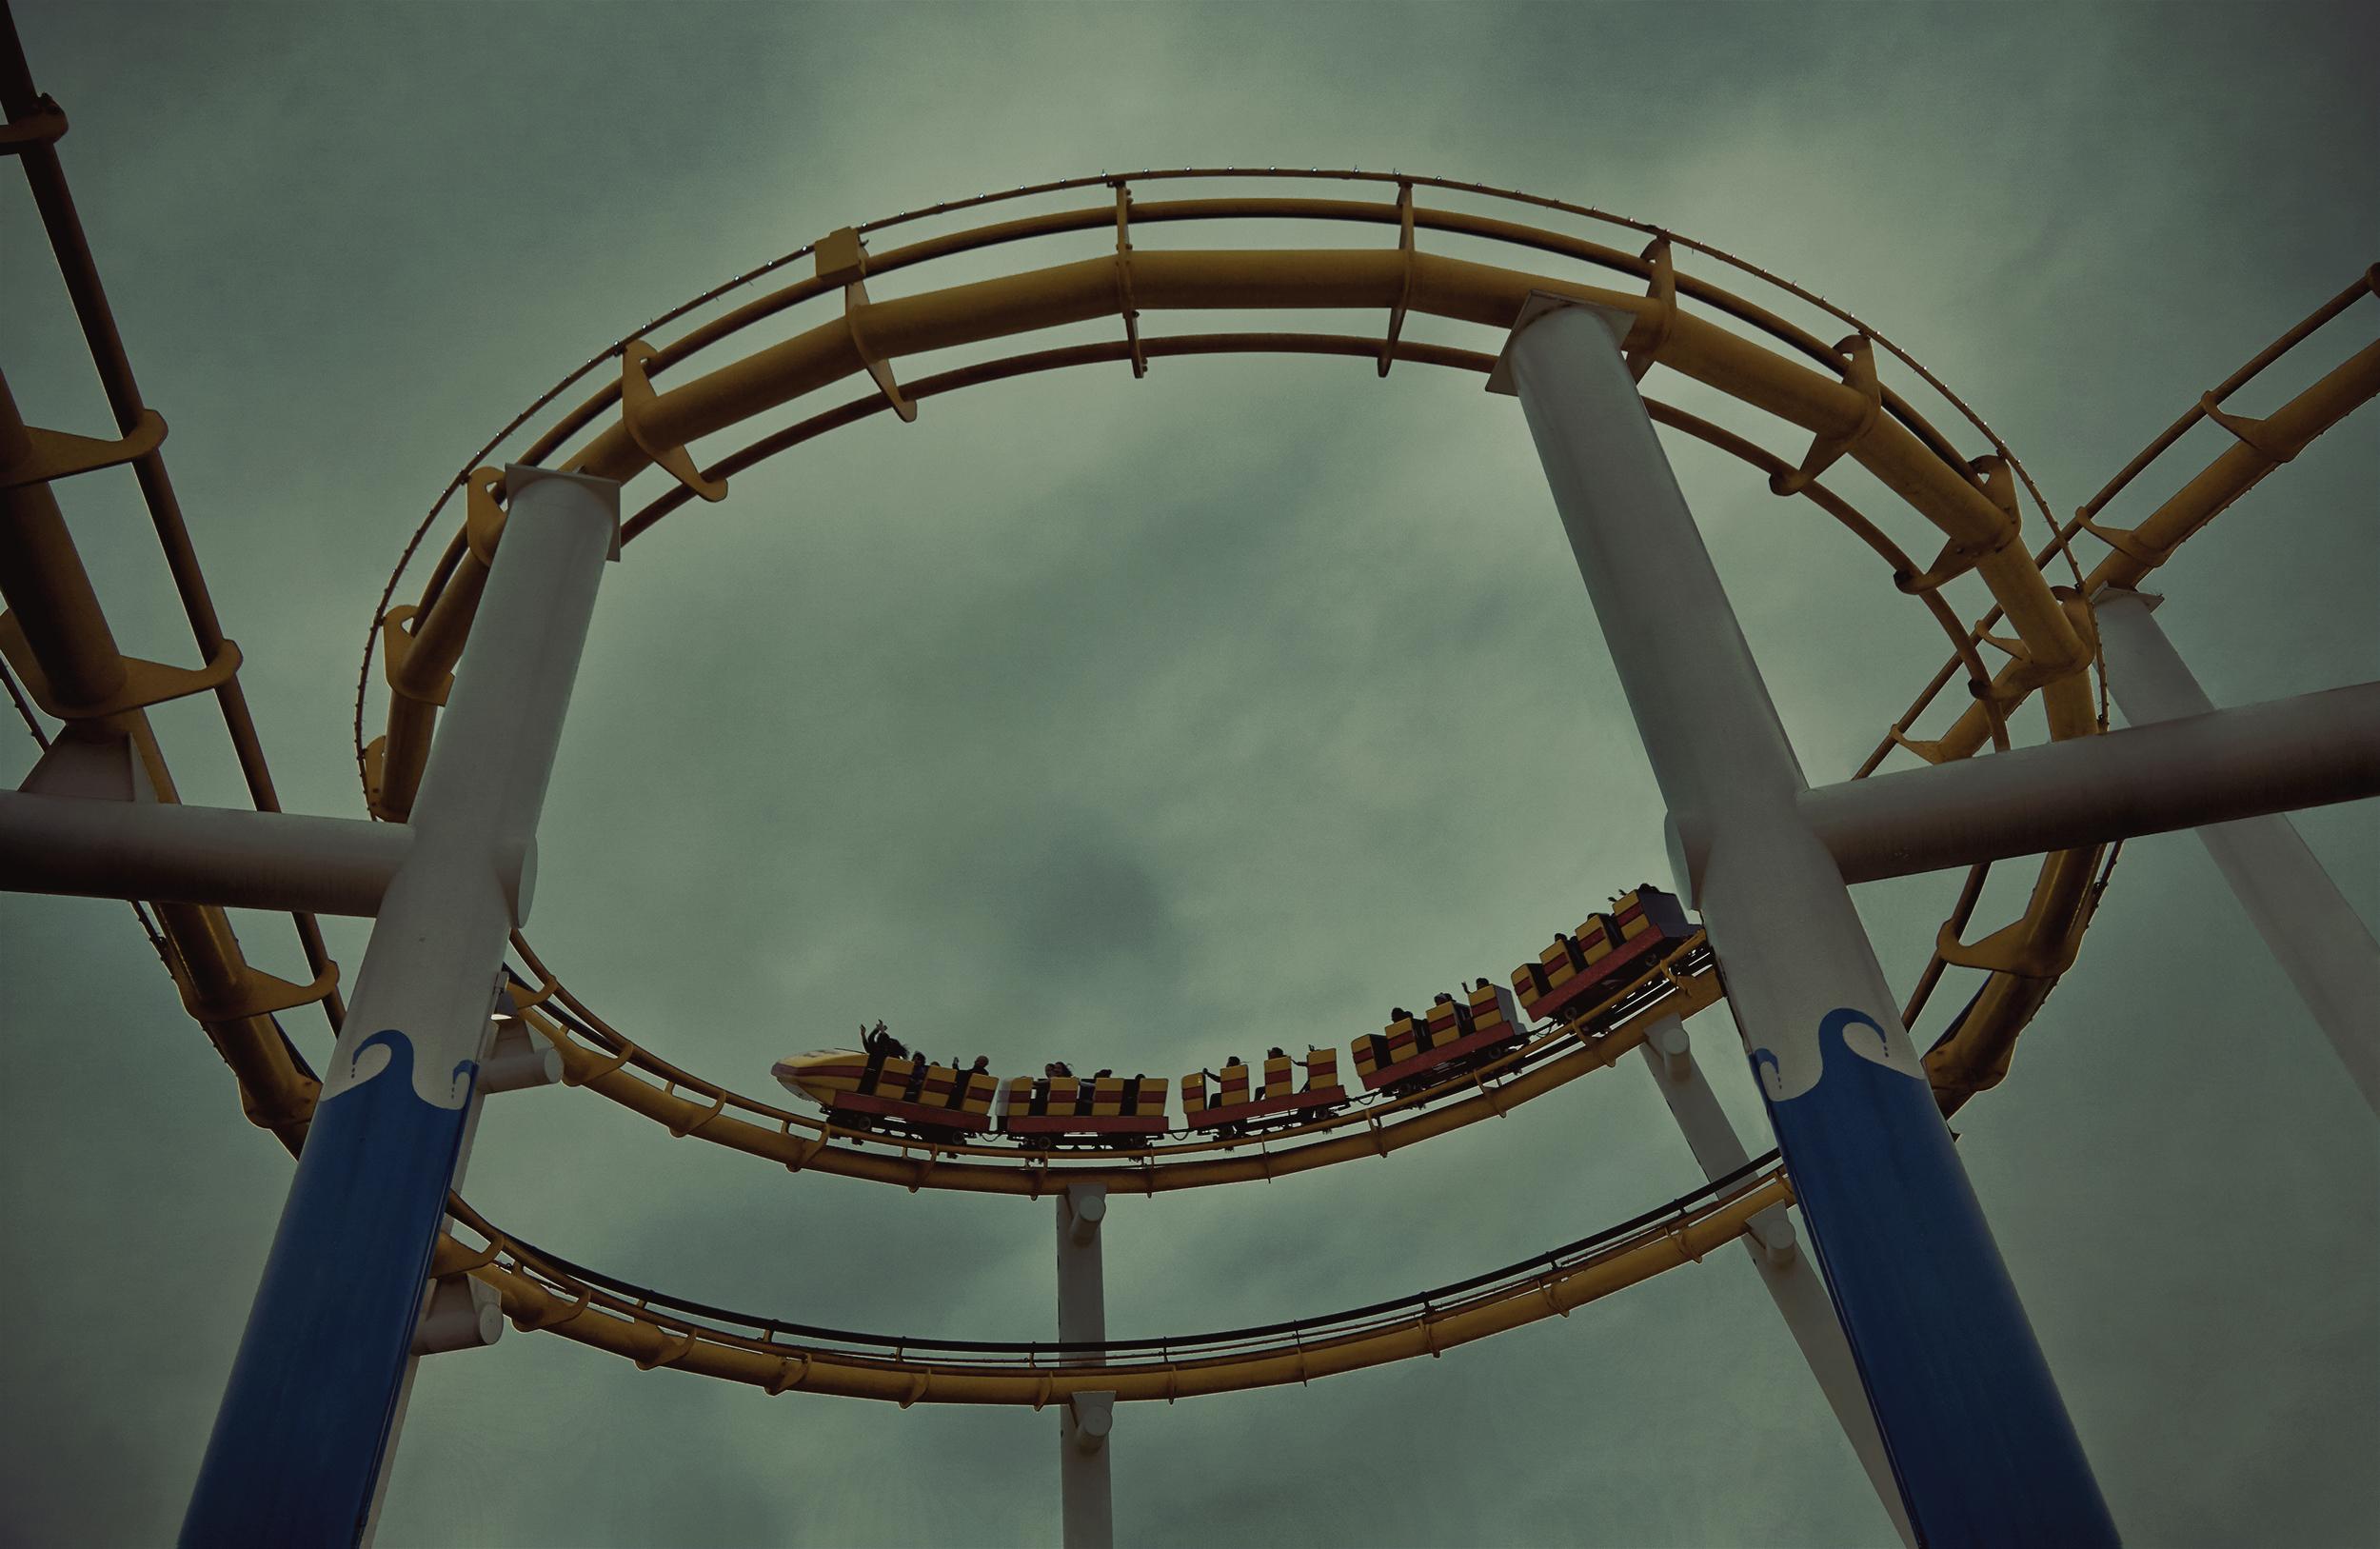 low+res+roller+coaster_MG_9661.jpg